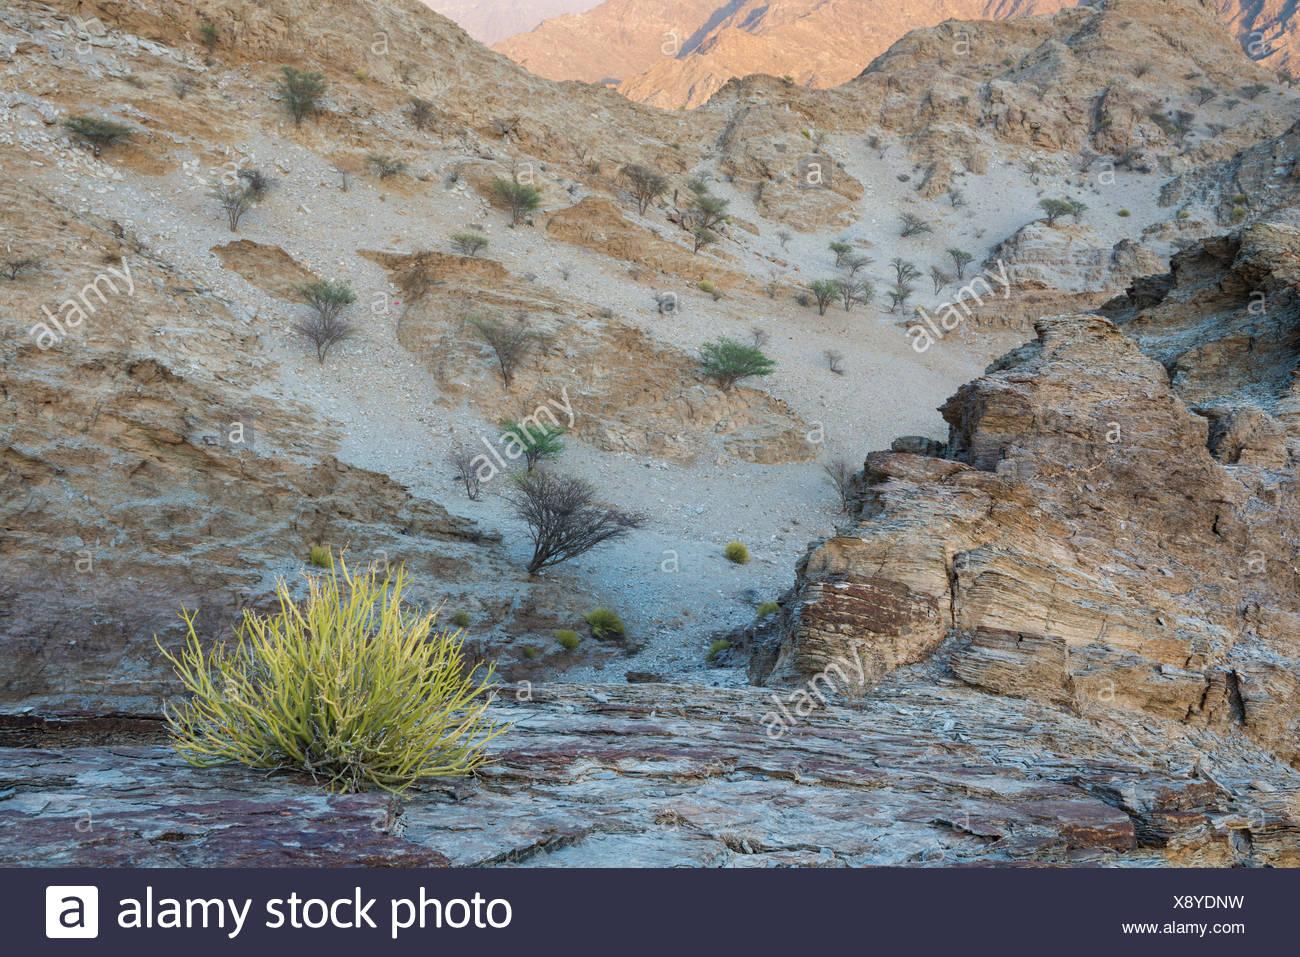 Sunrise over mountain landscape with sedimentary rocks. - Stock Image